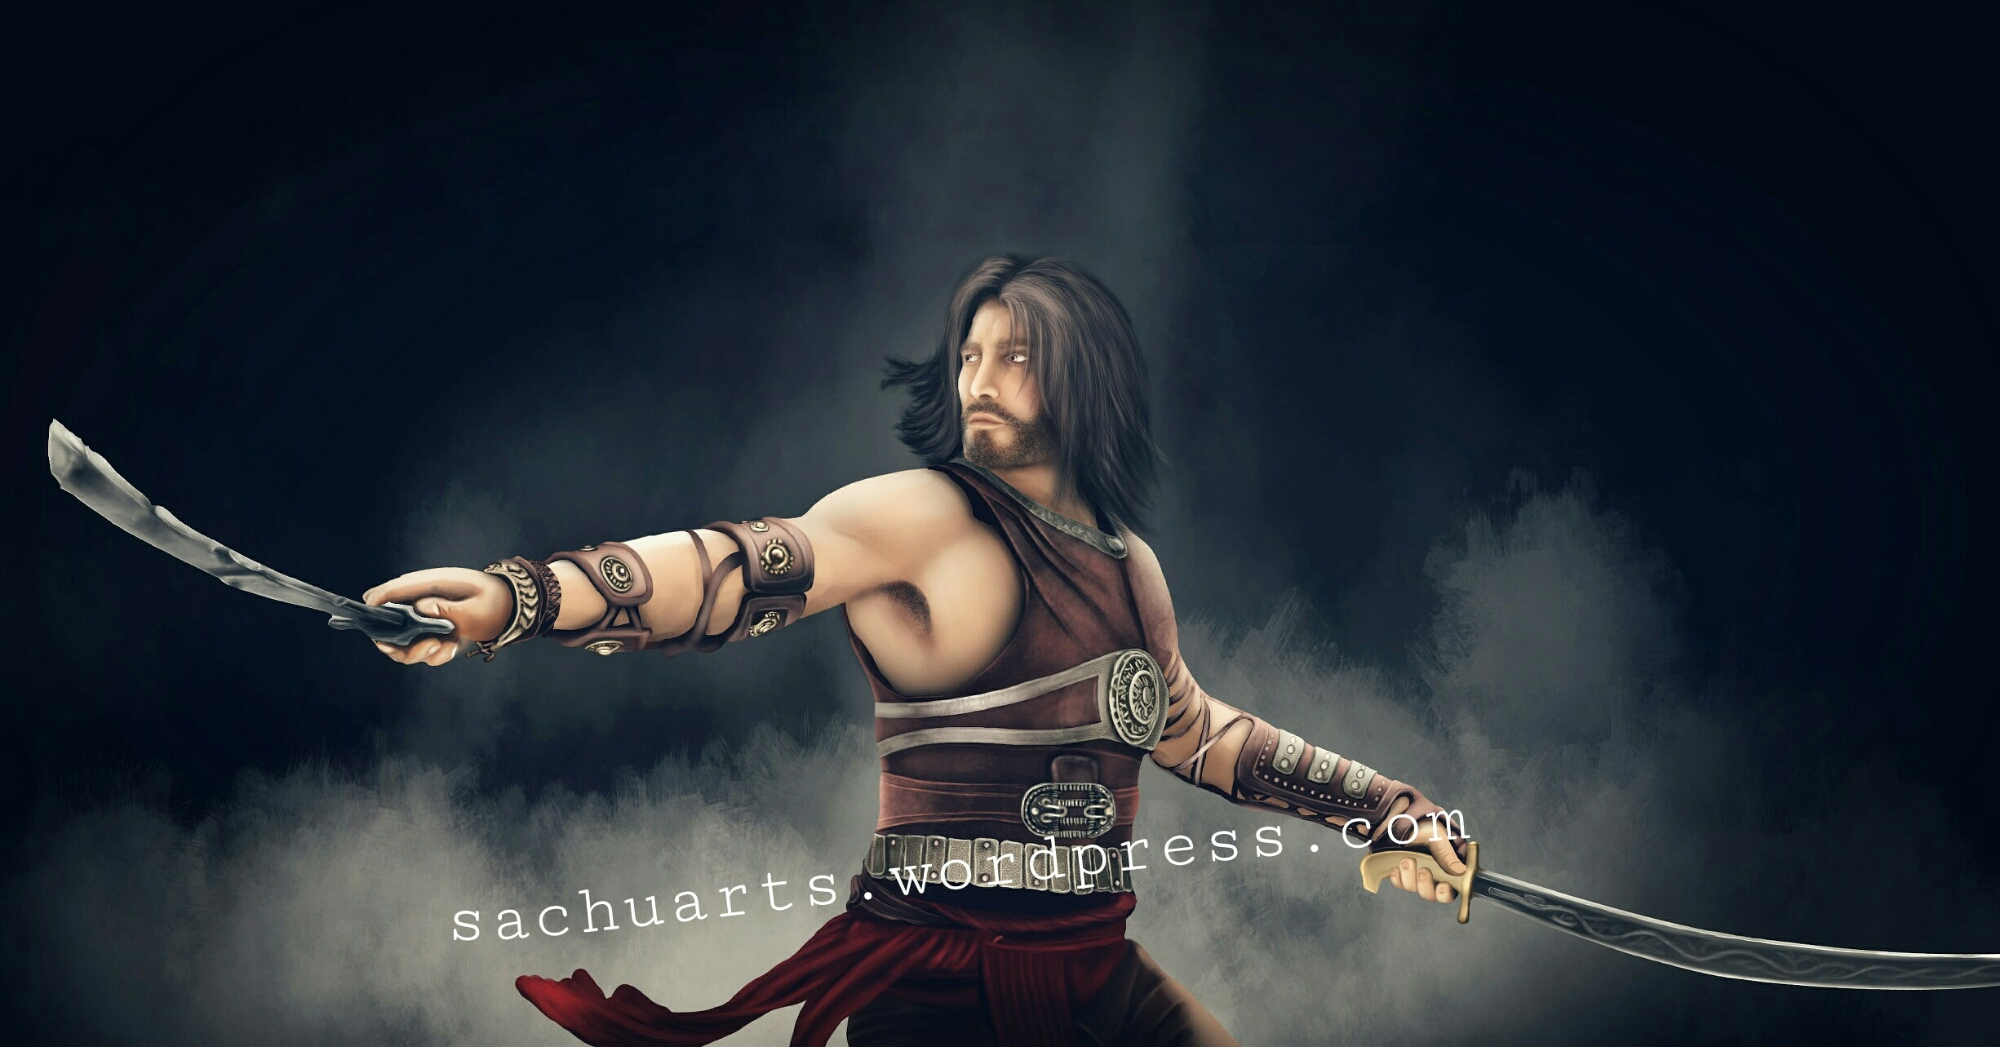 Prince of Persia digital painting